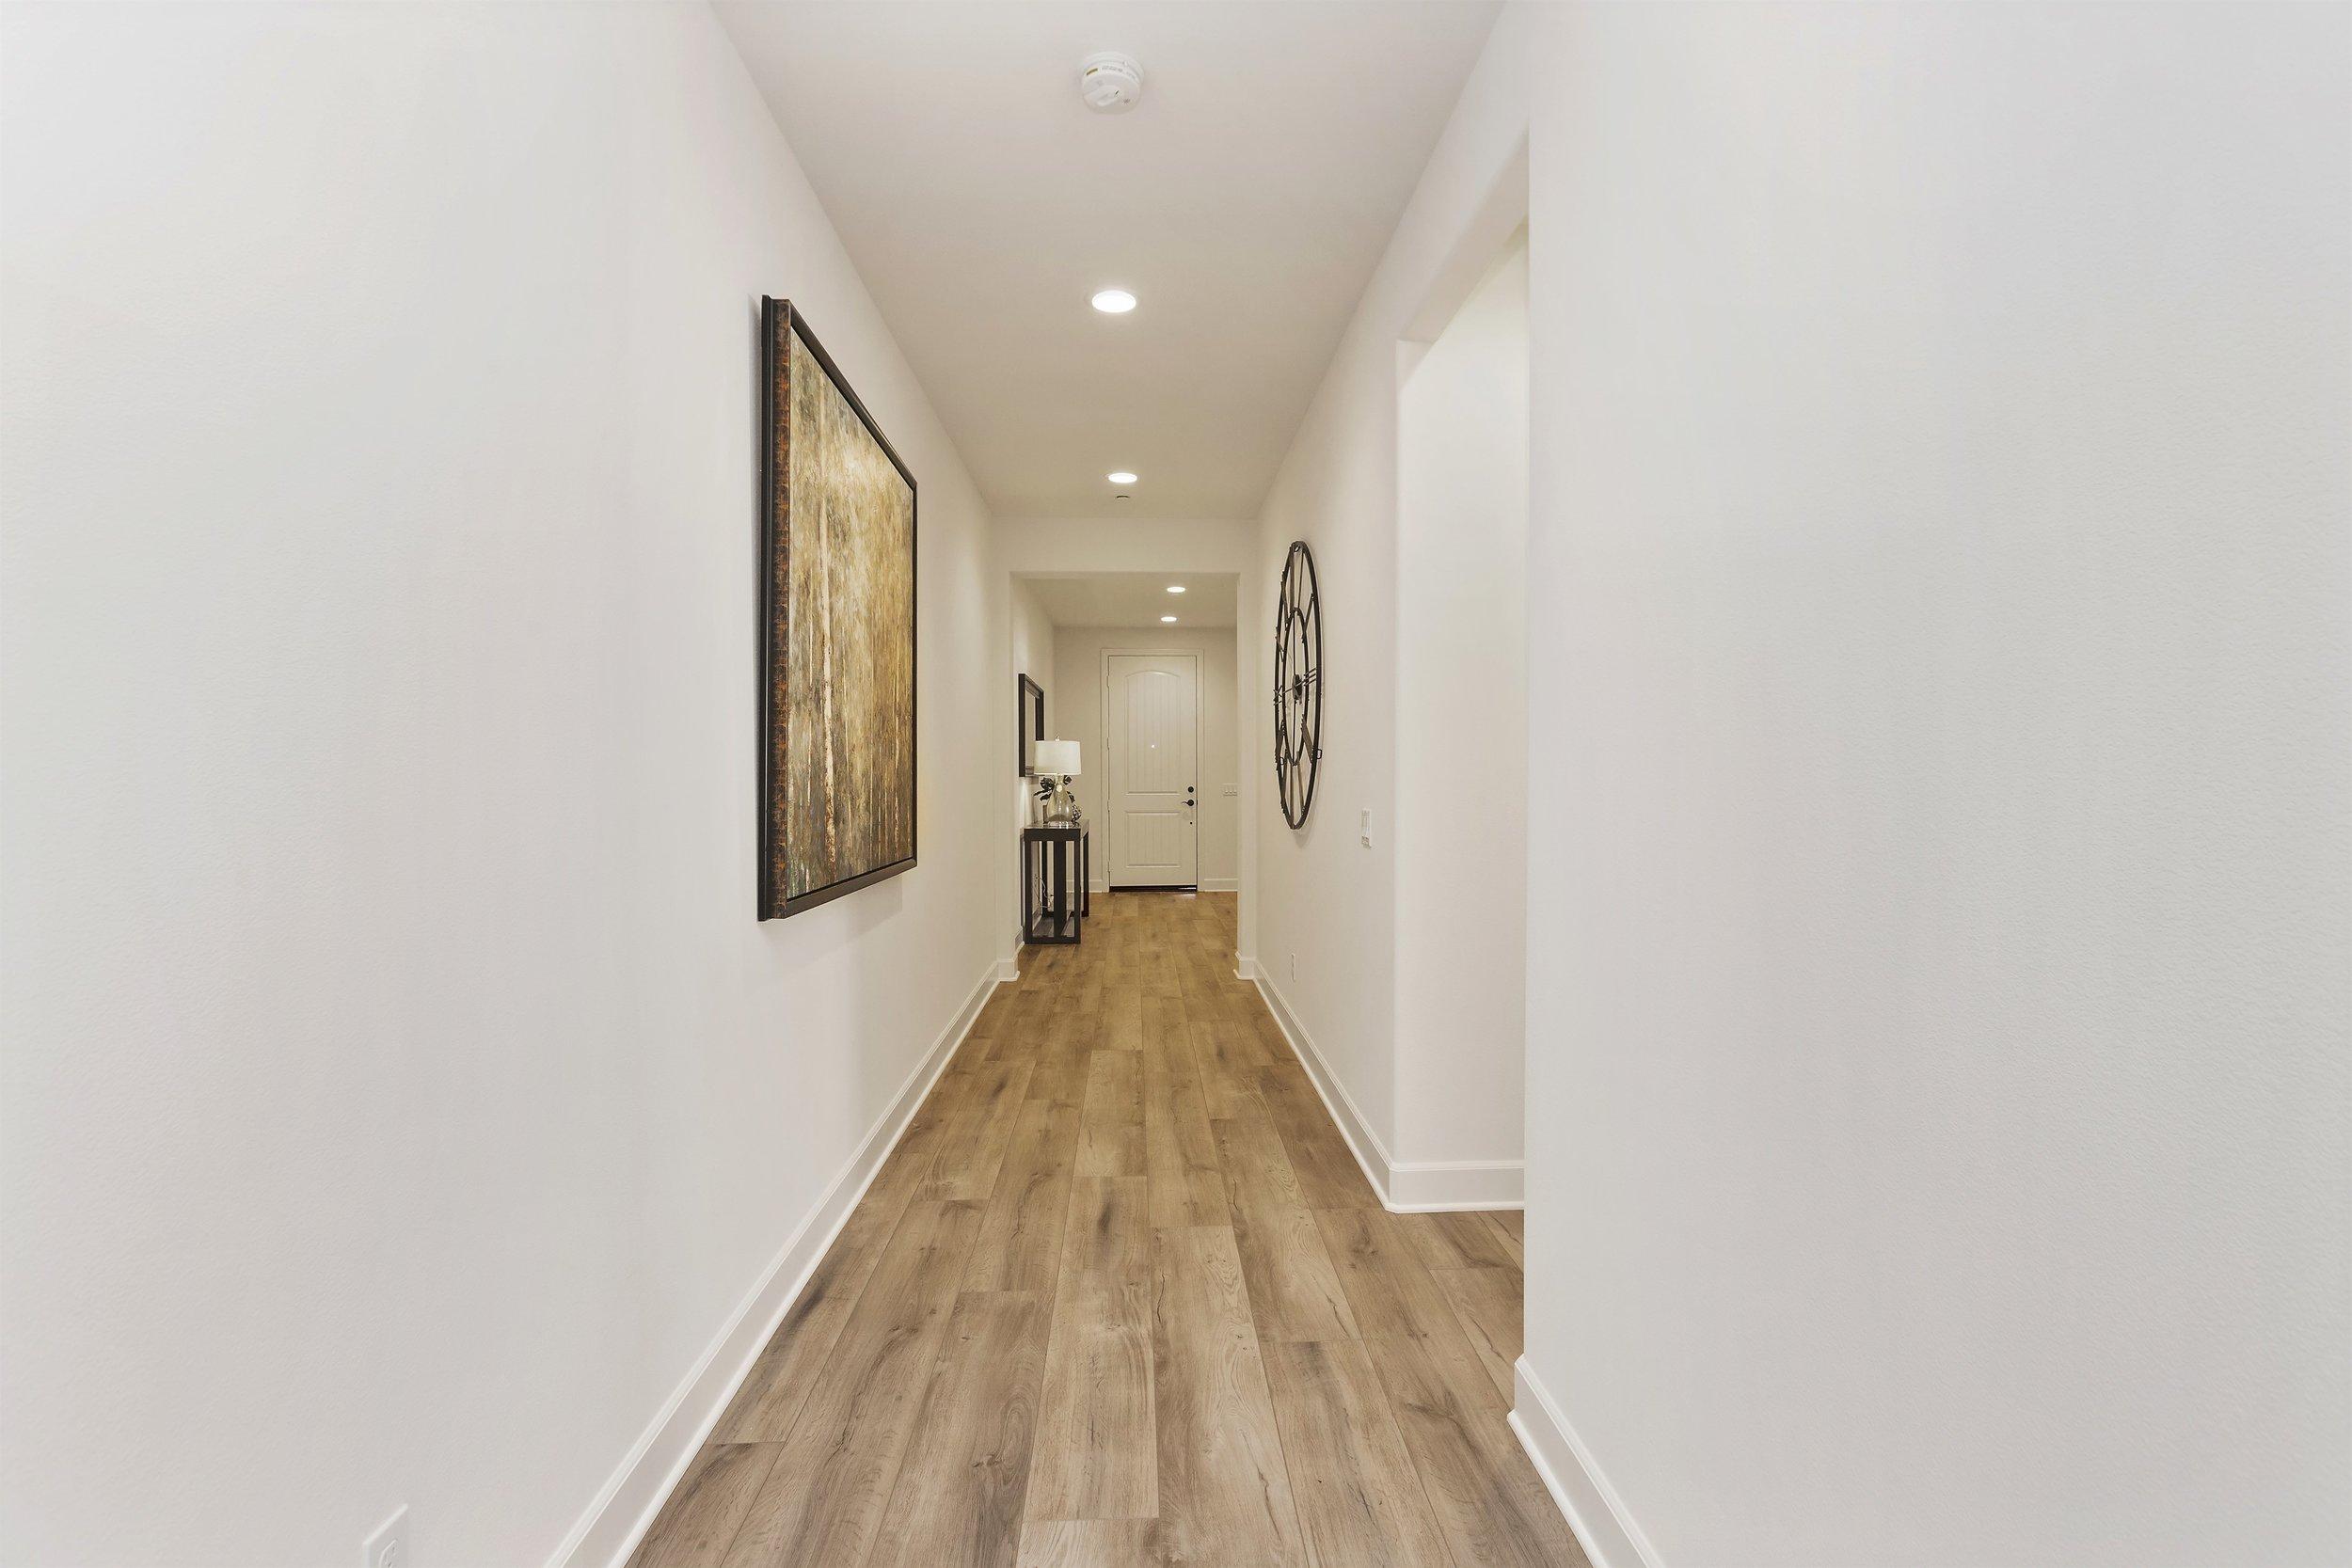 012_Hallway.jpg